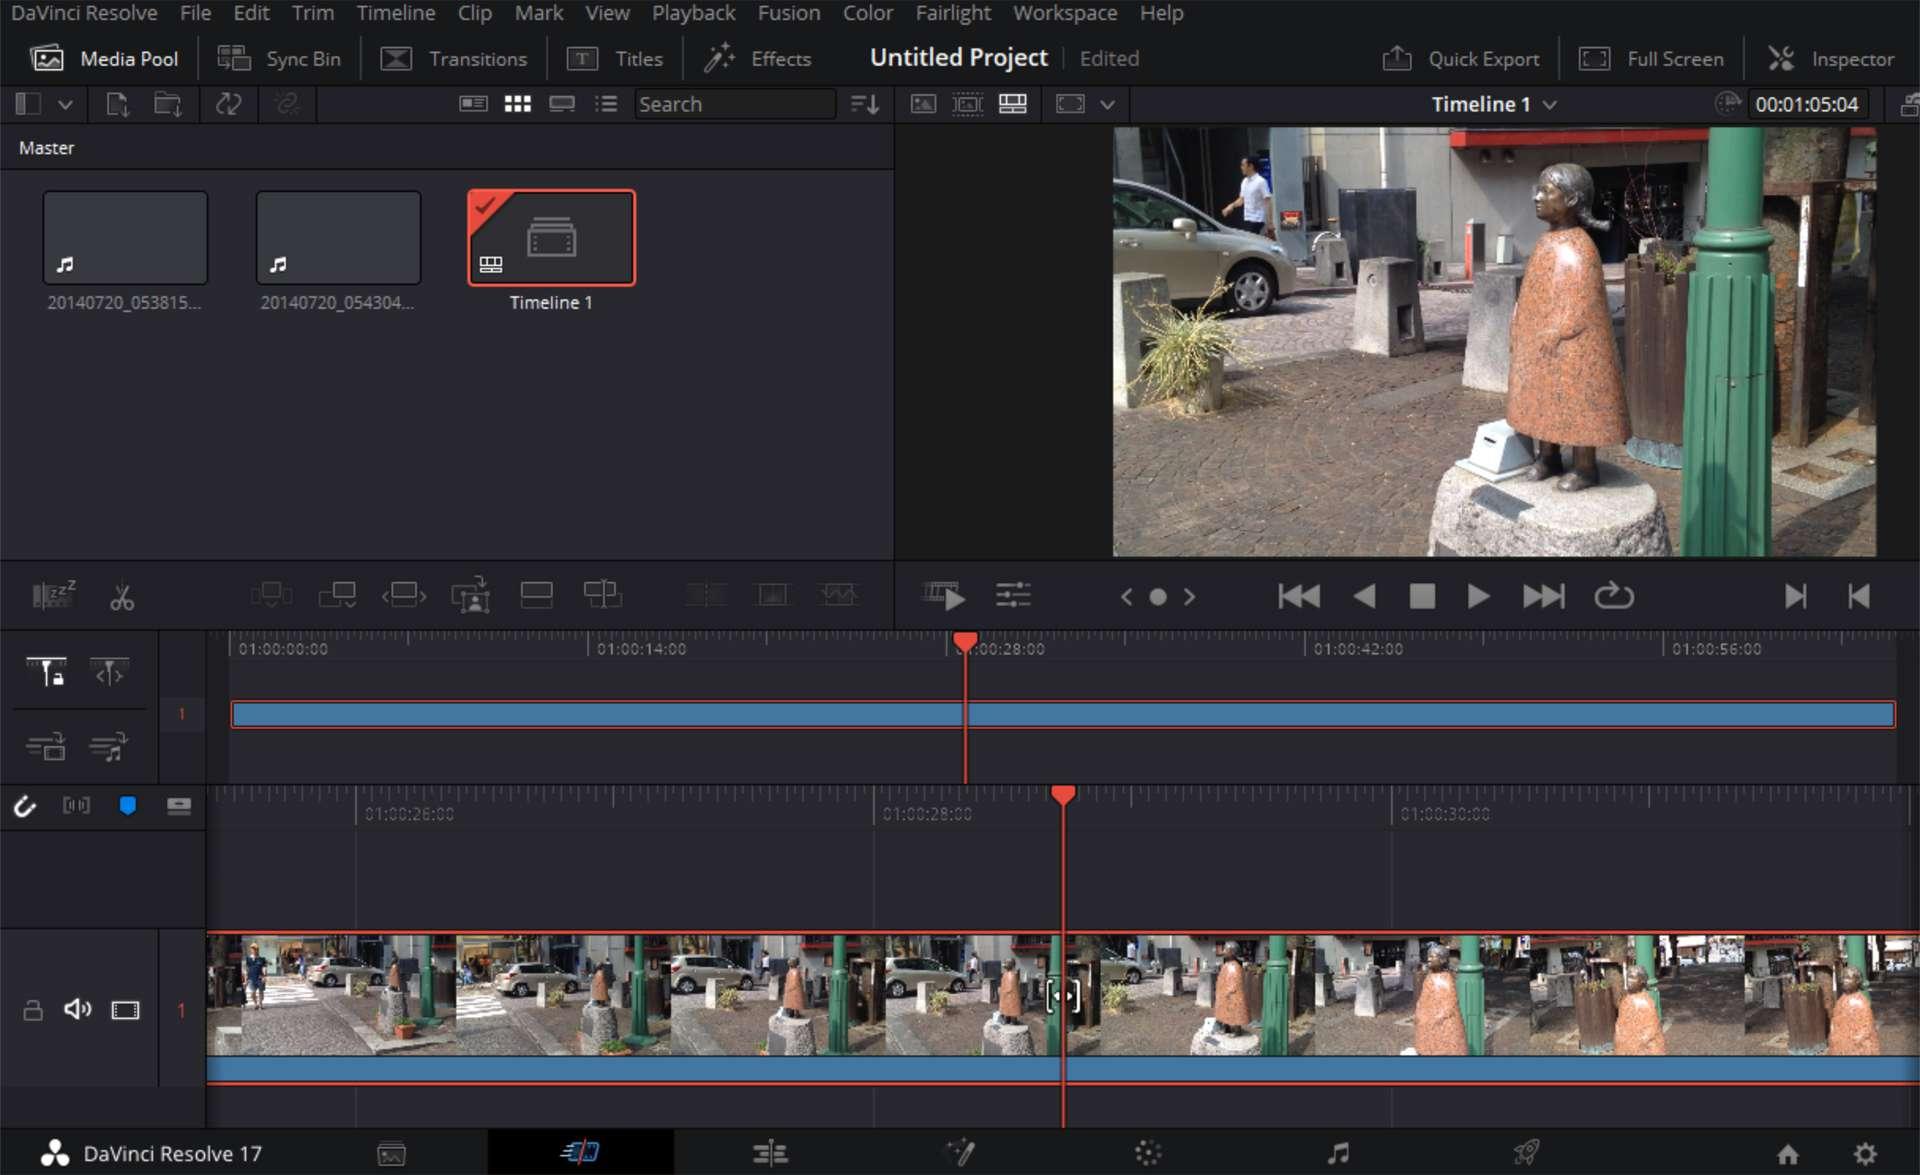 DaVinci Resolve video editing app on Windows 10.